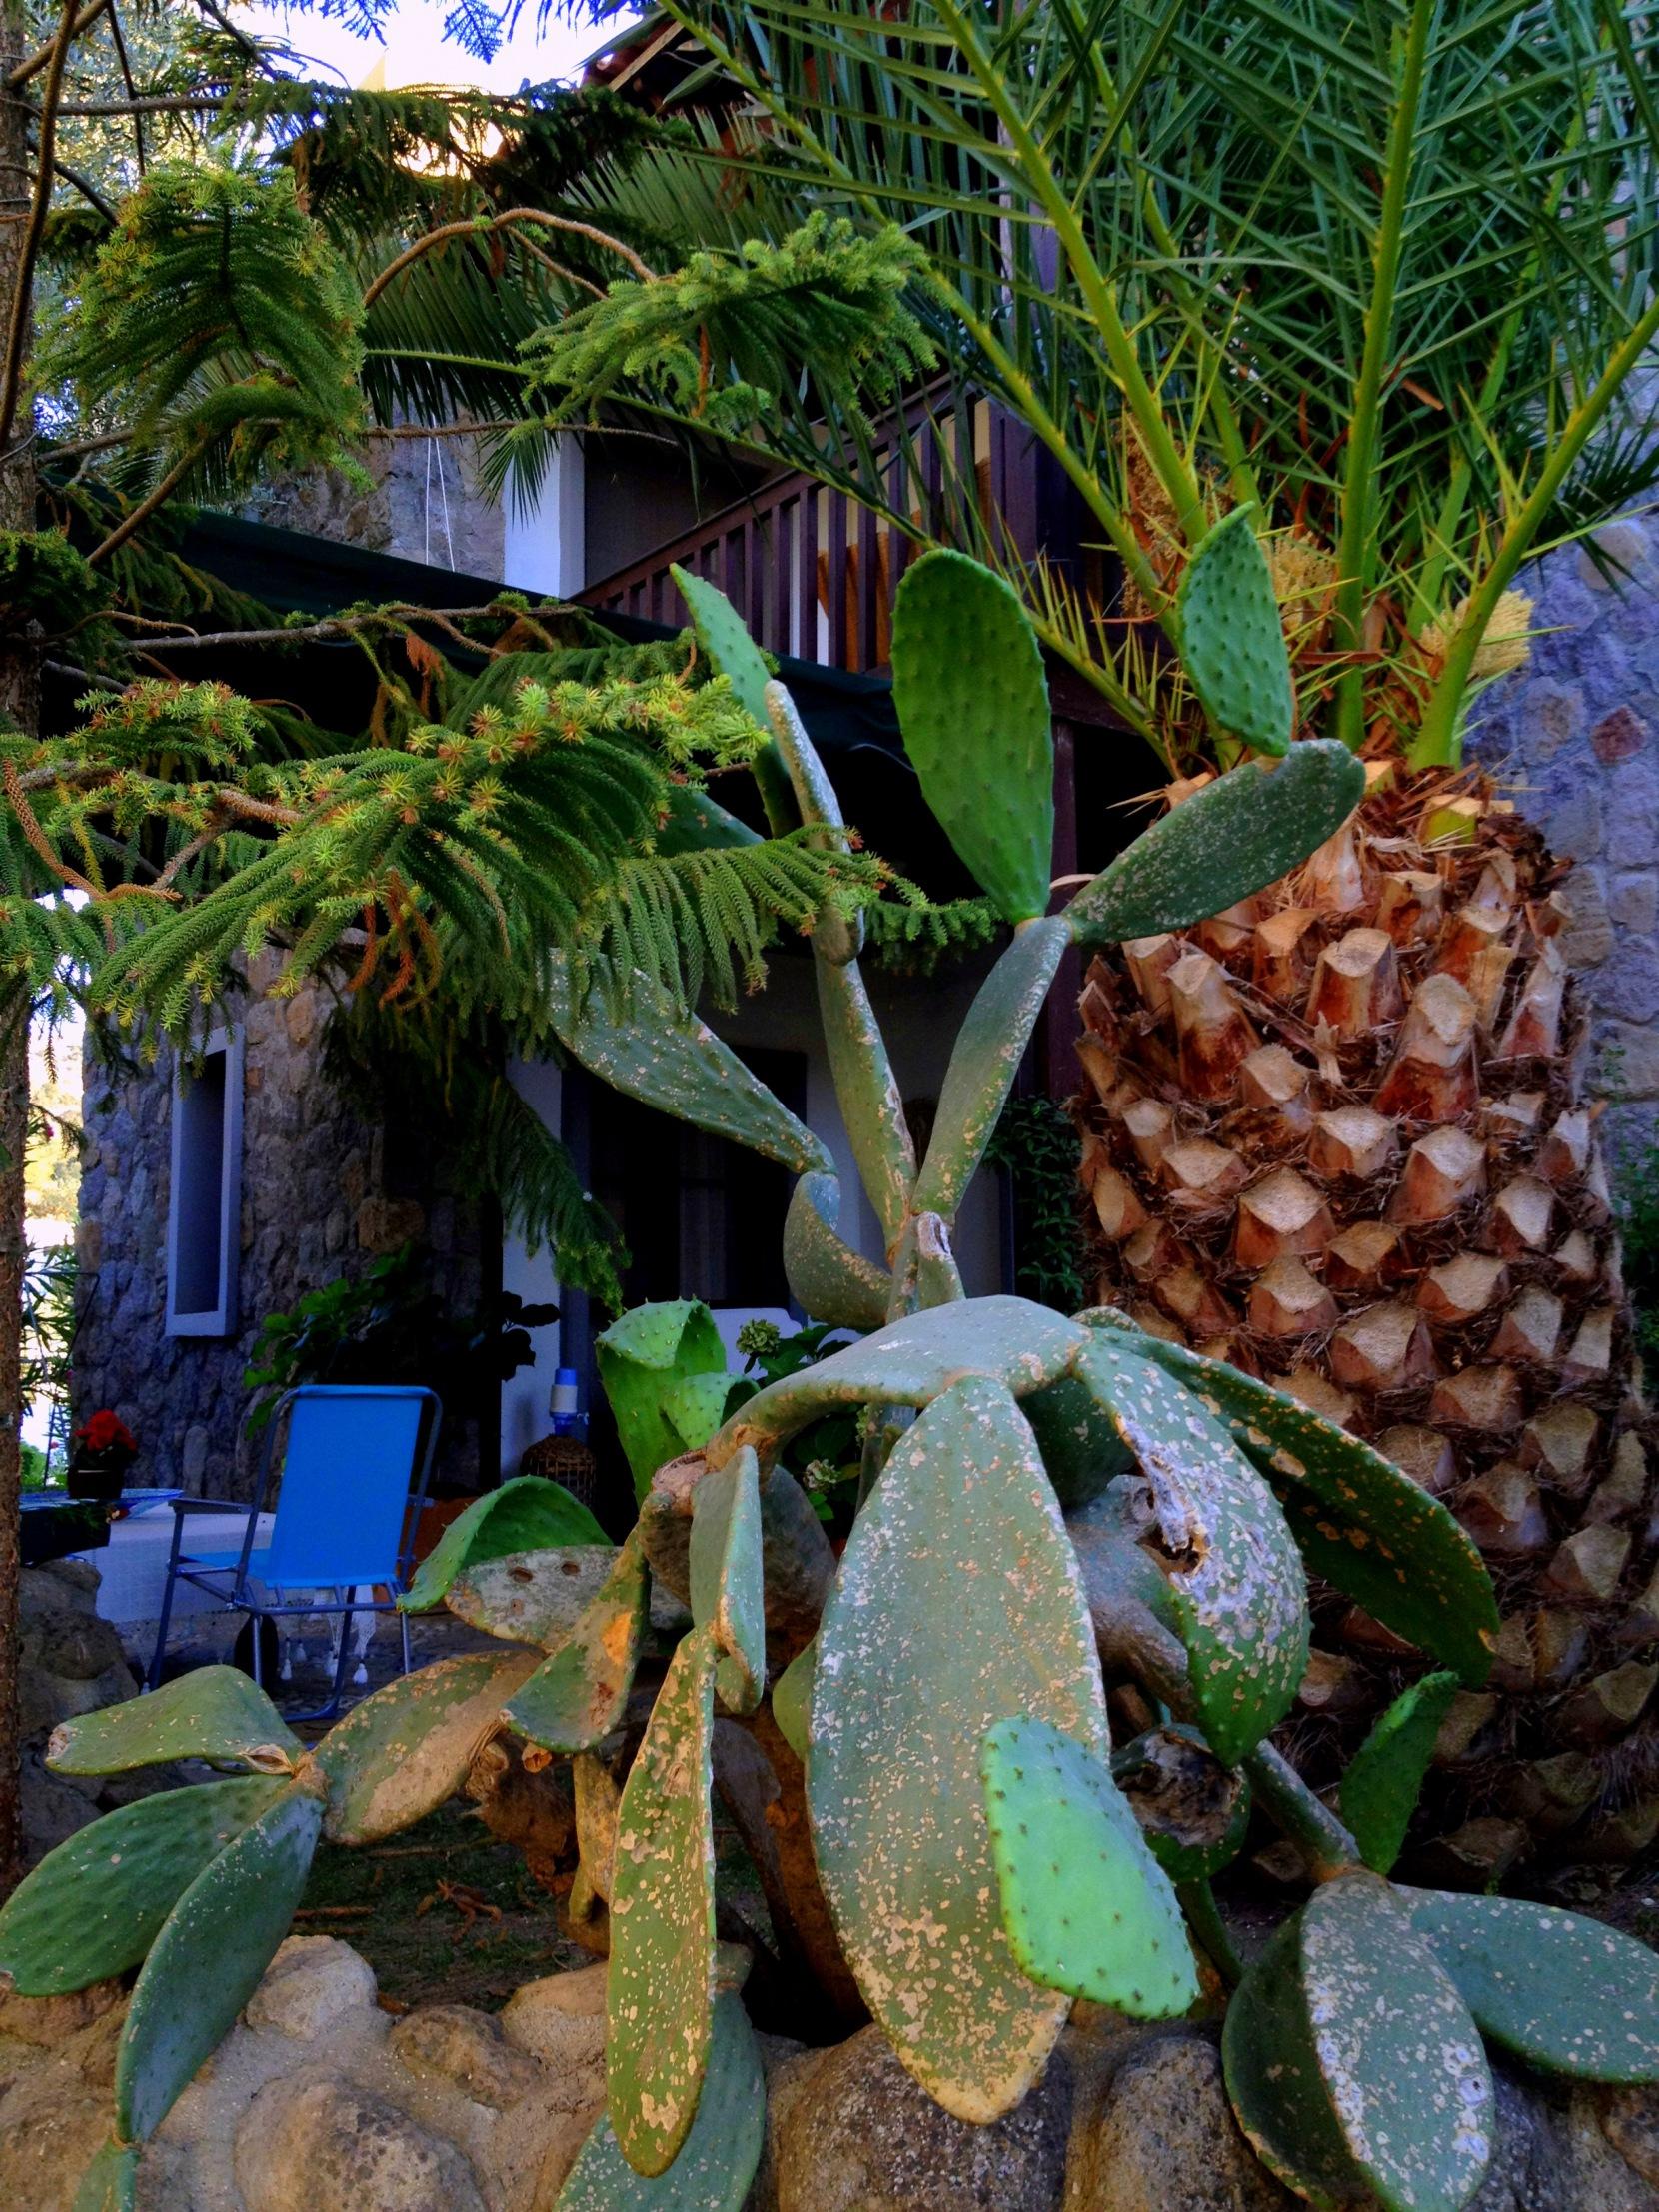 Cactus and Palmtree